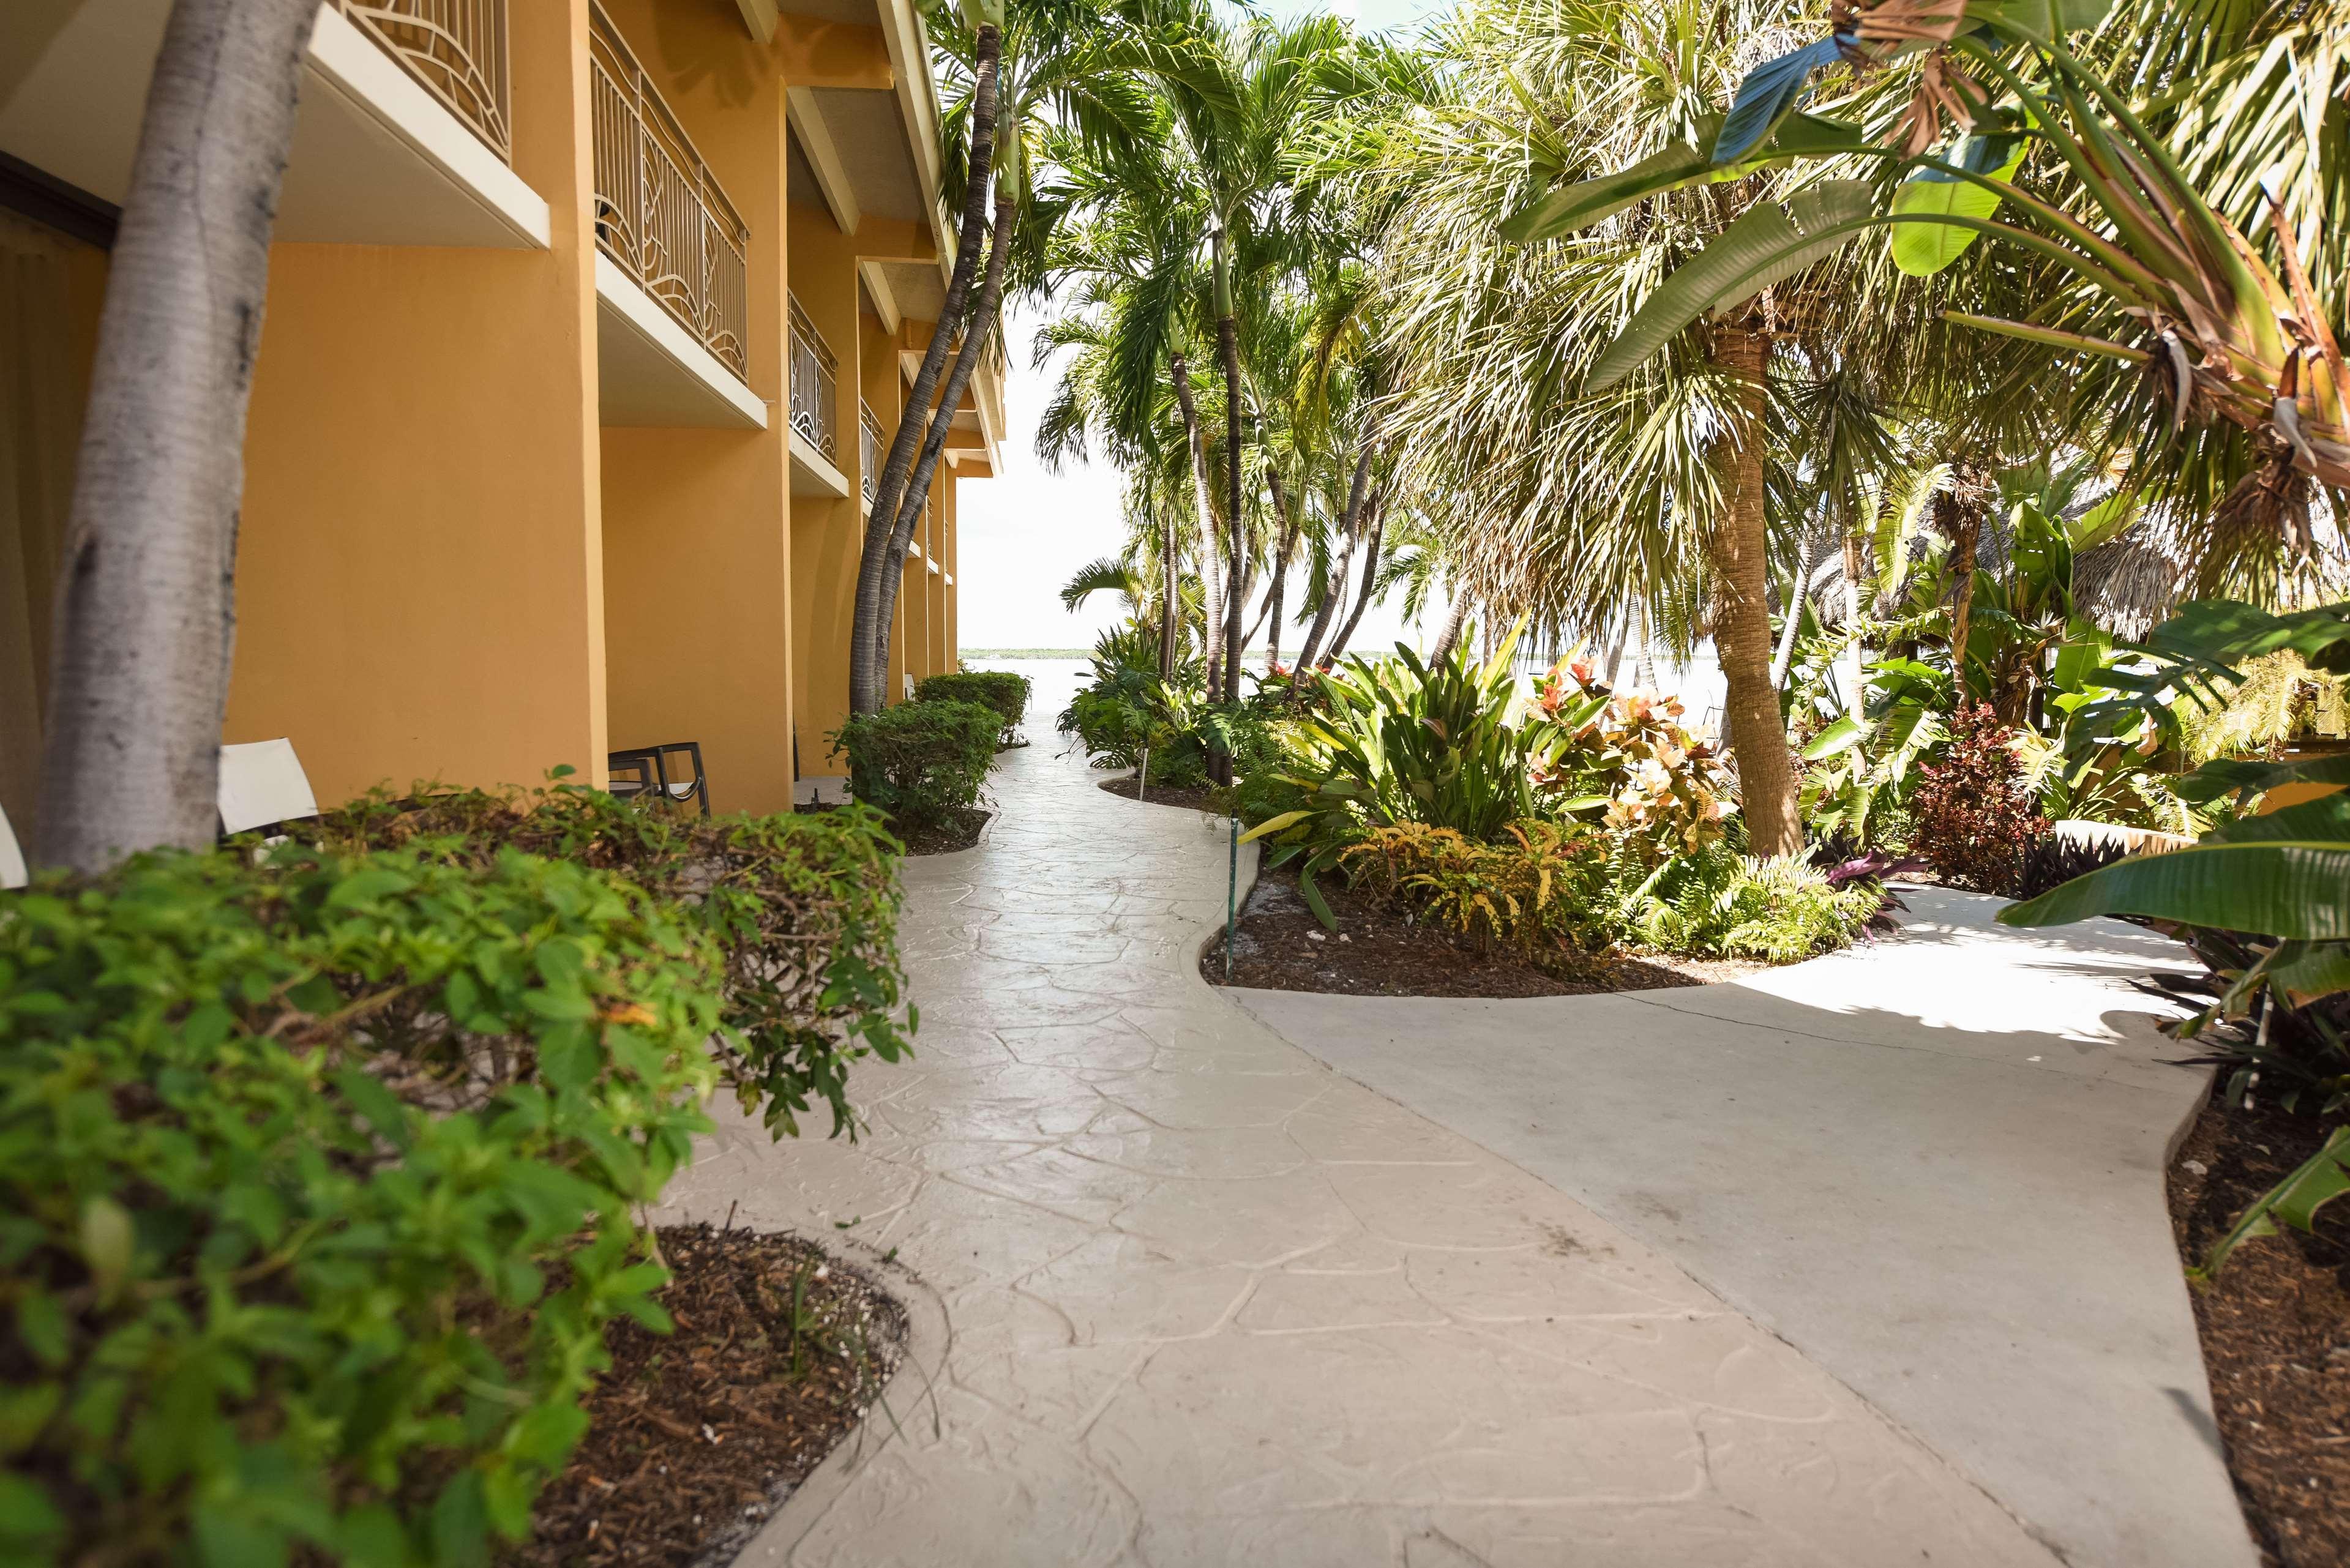 Hampton Inn Key Largo, FL image 3